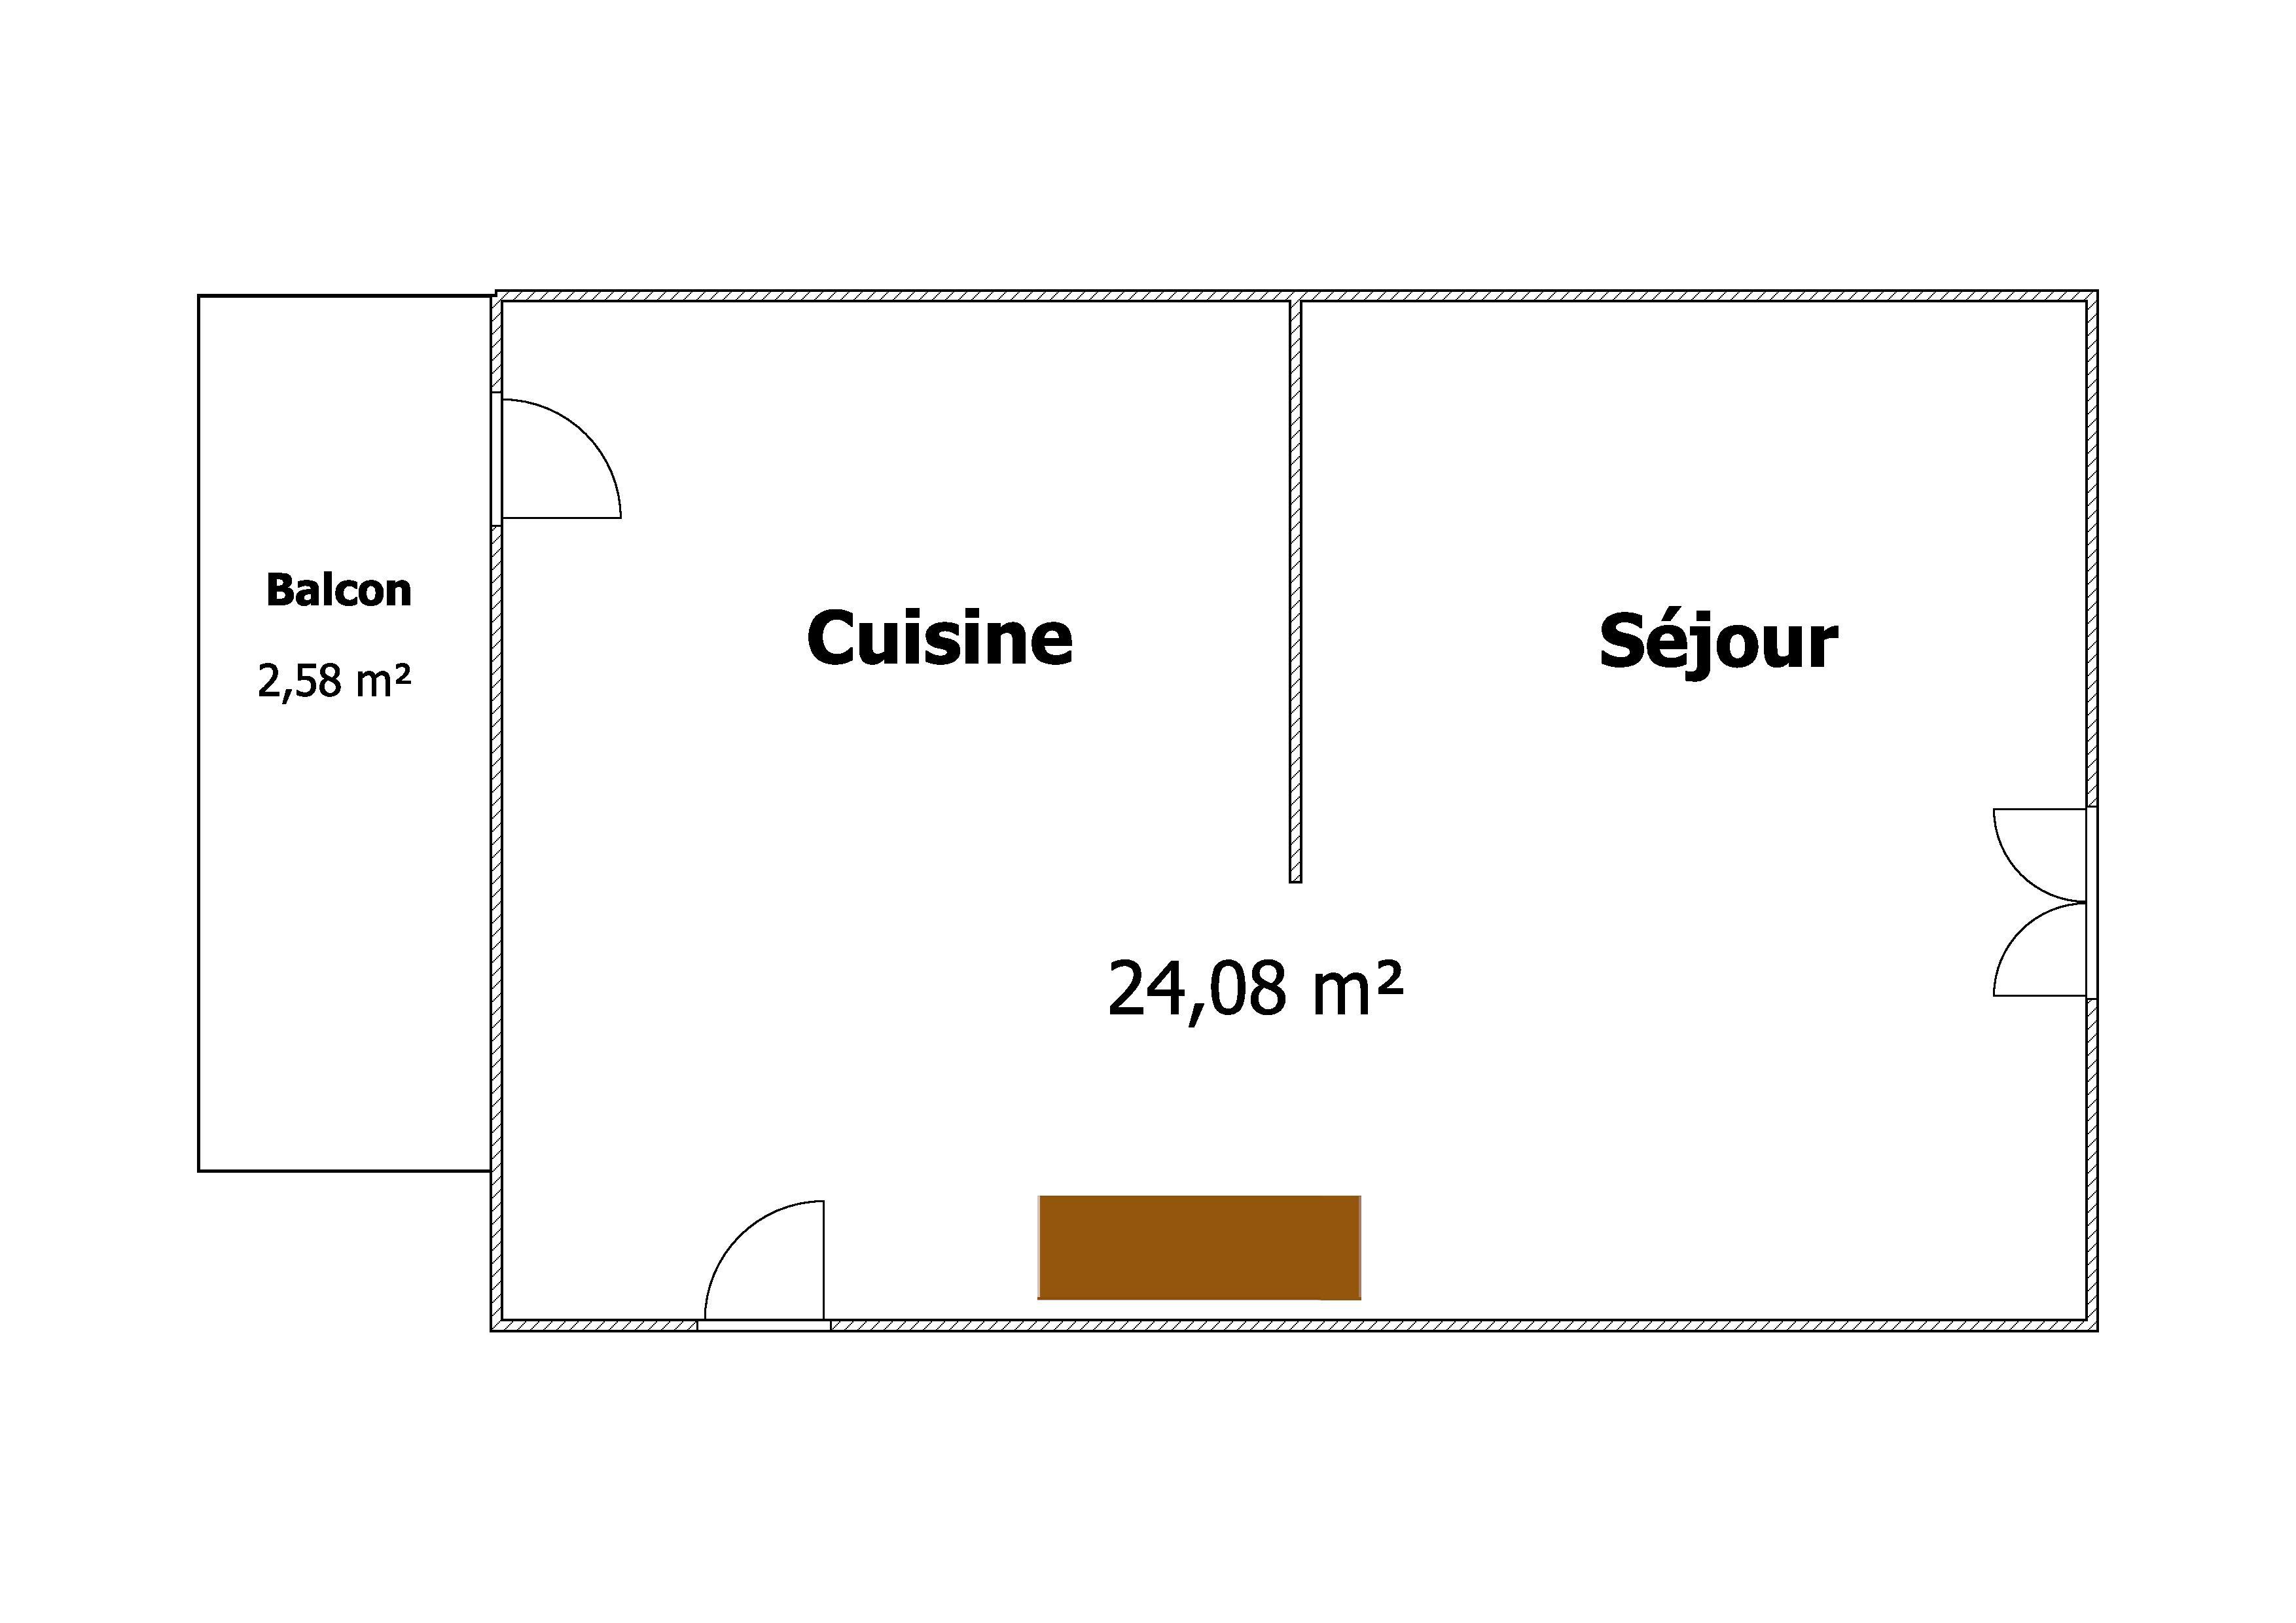 Plan étage 1 ZOOM